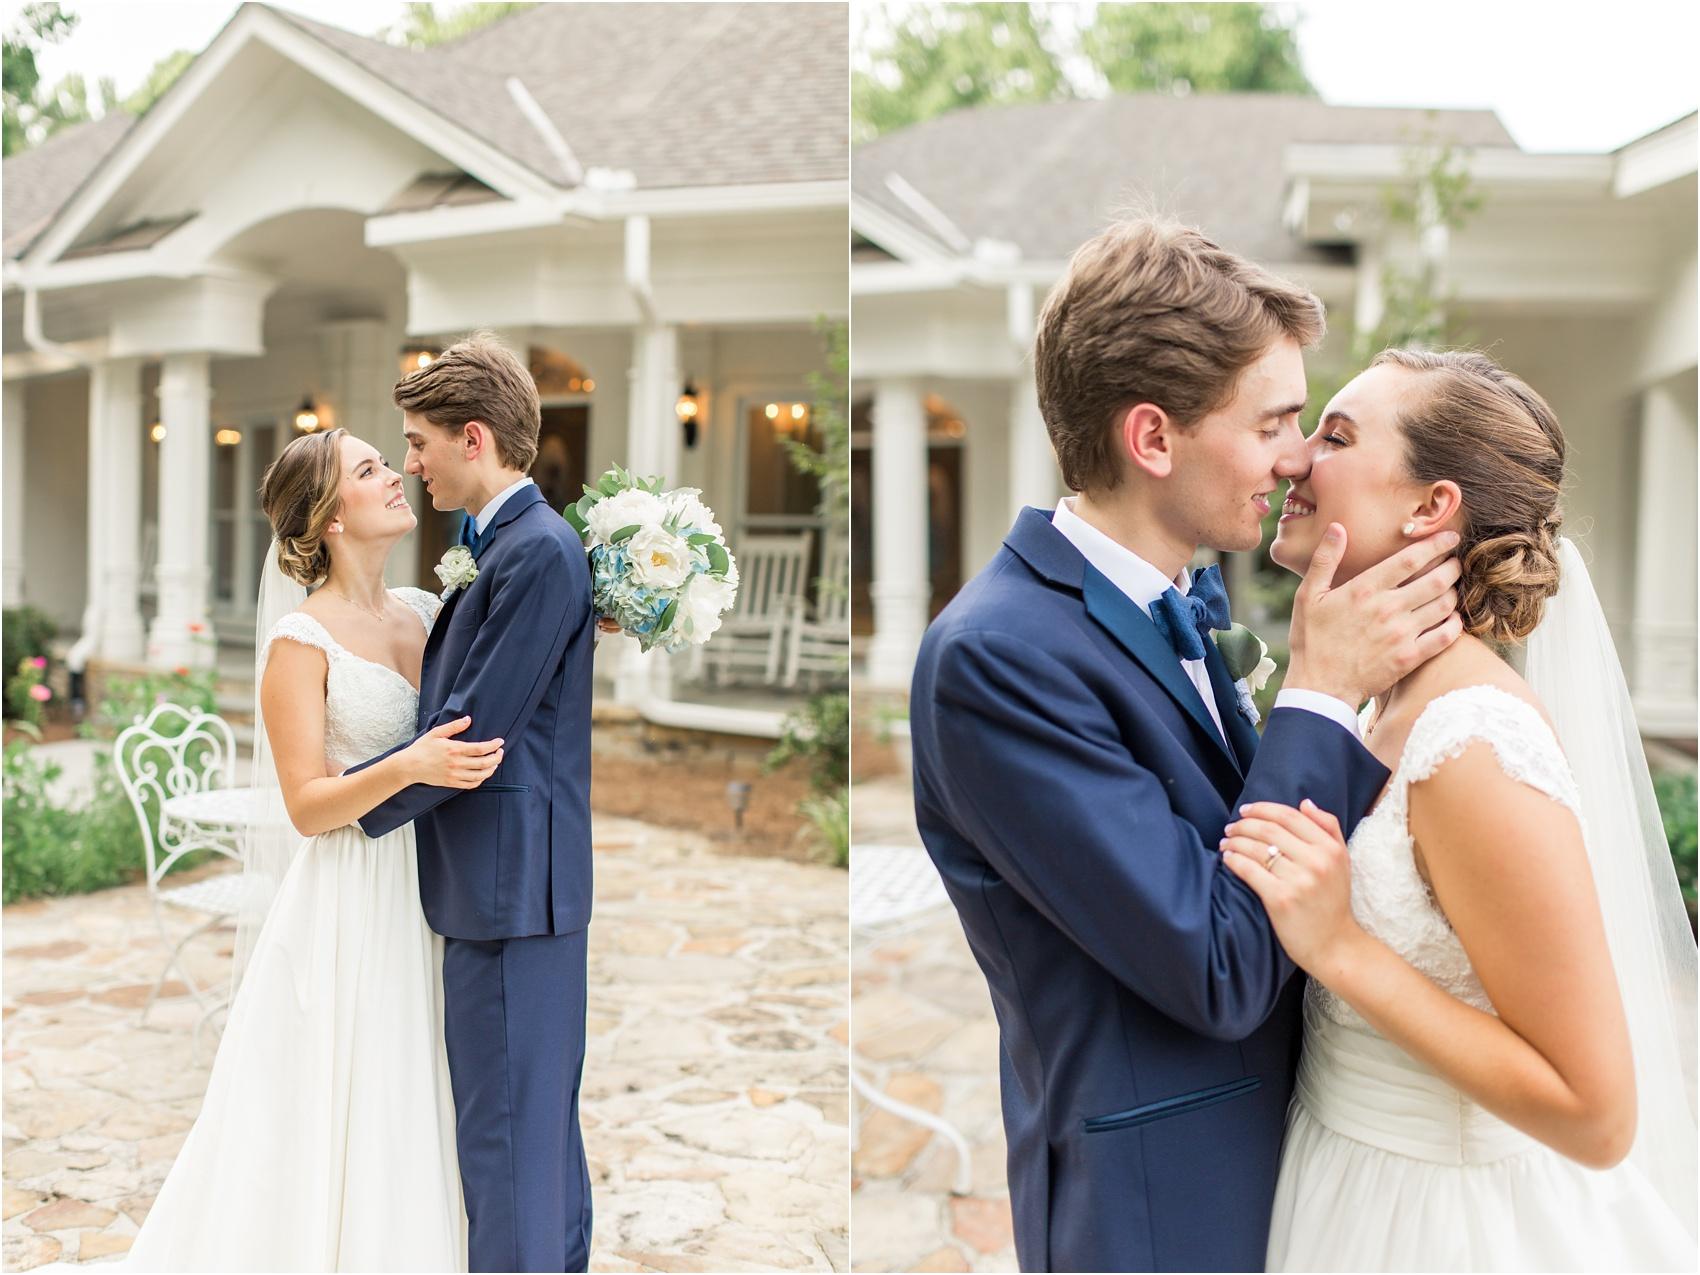 Savannah Eve Photography- Sigl-Adams Wedding- Sneak Peek-60.jpg